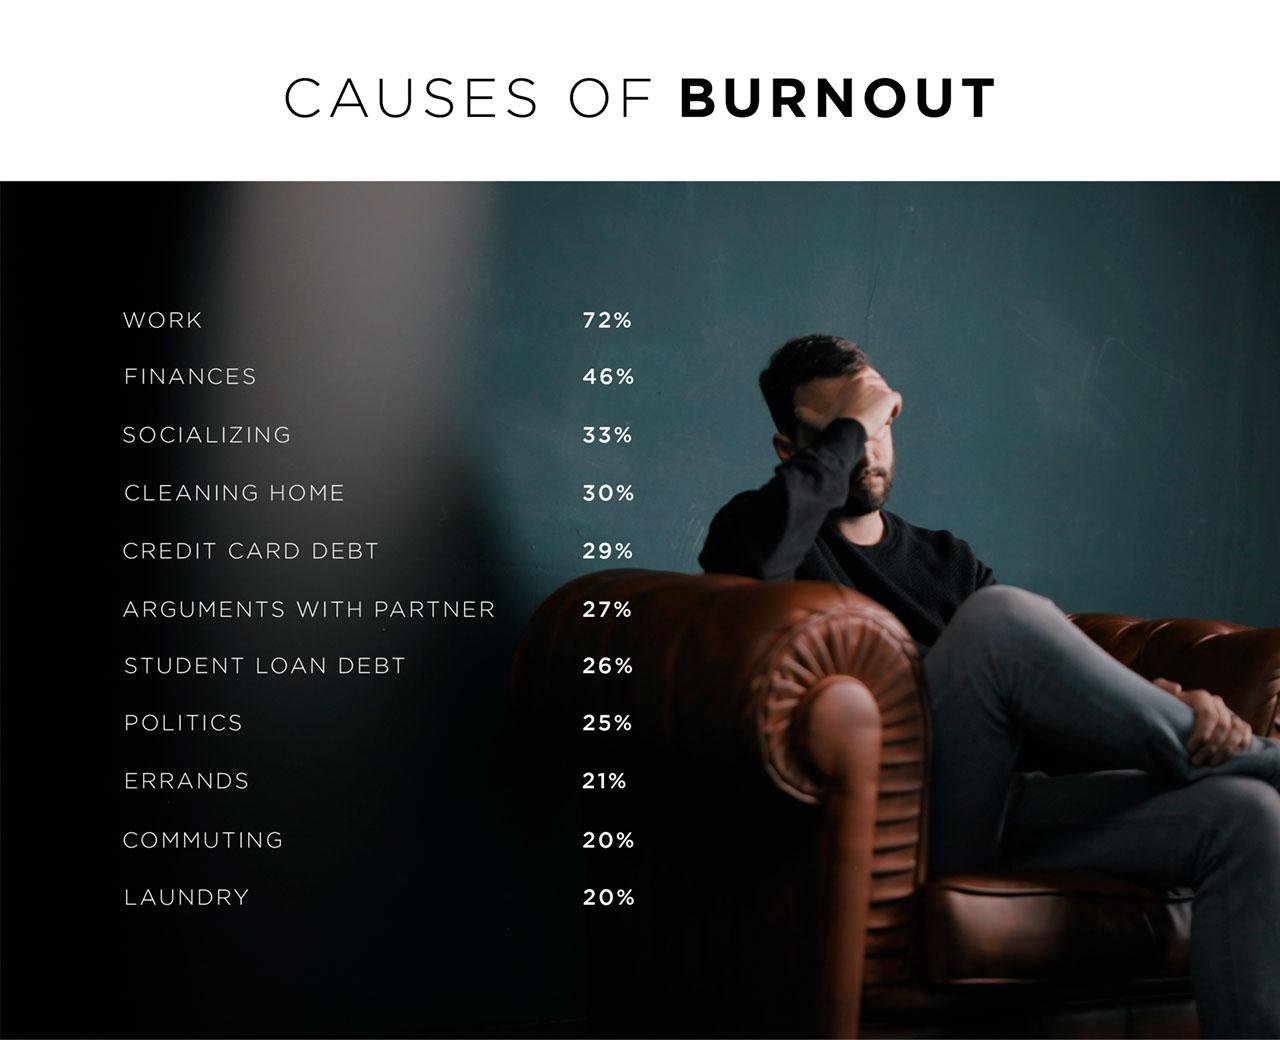 Millenial Burnout Causes